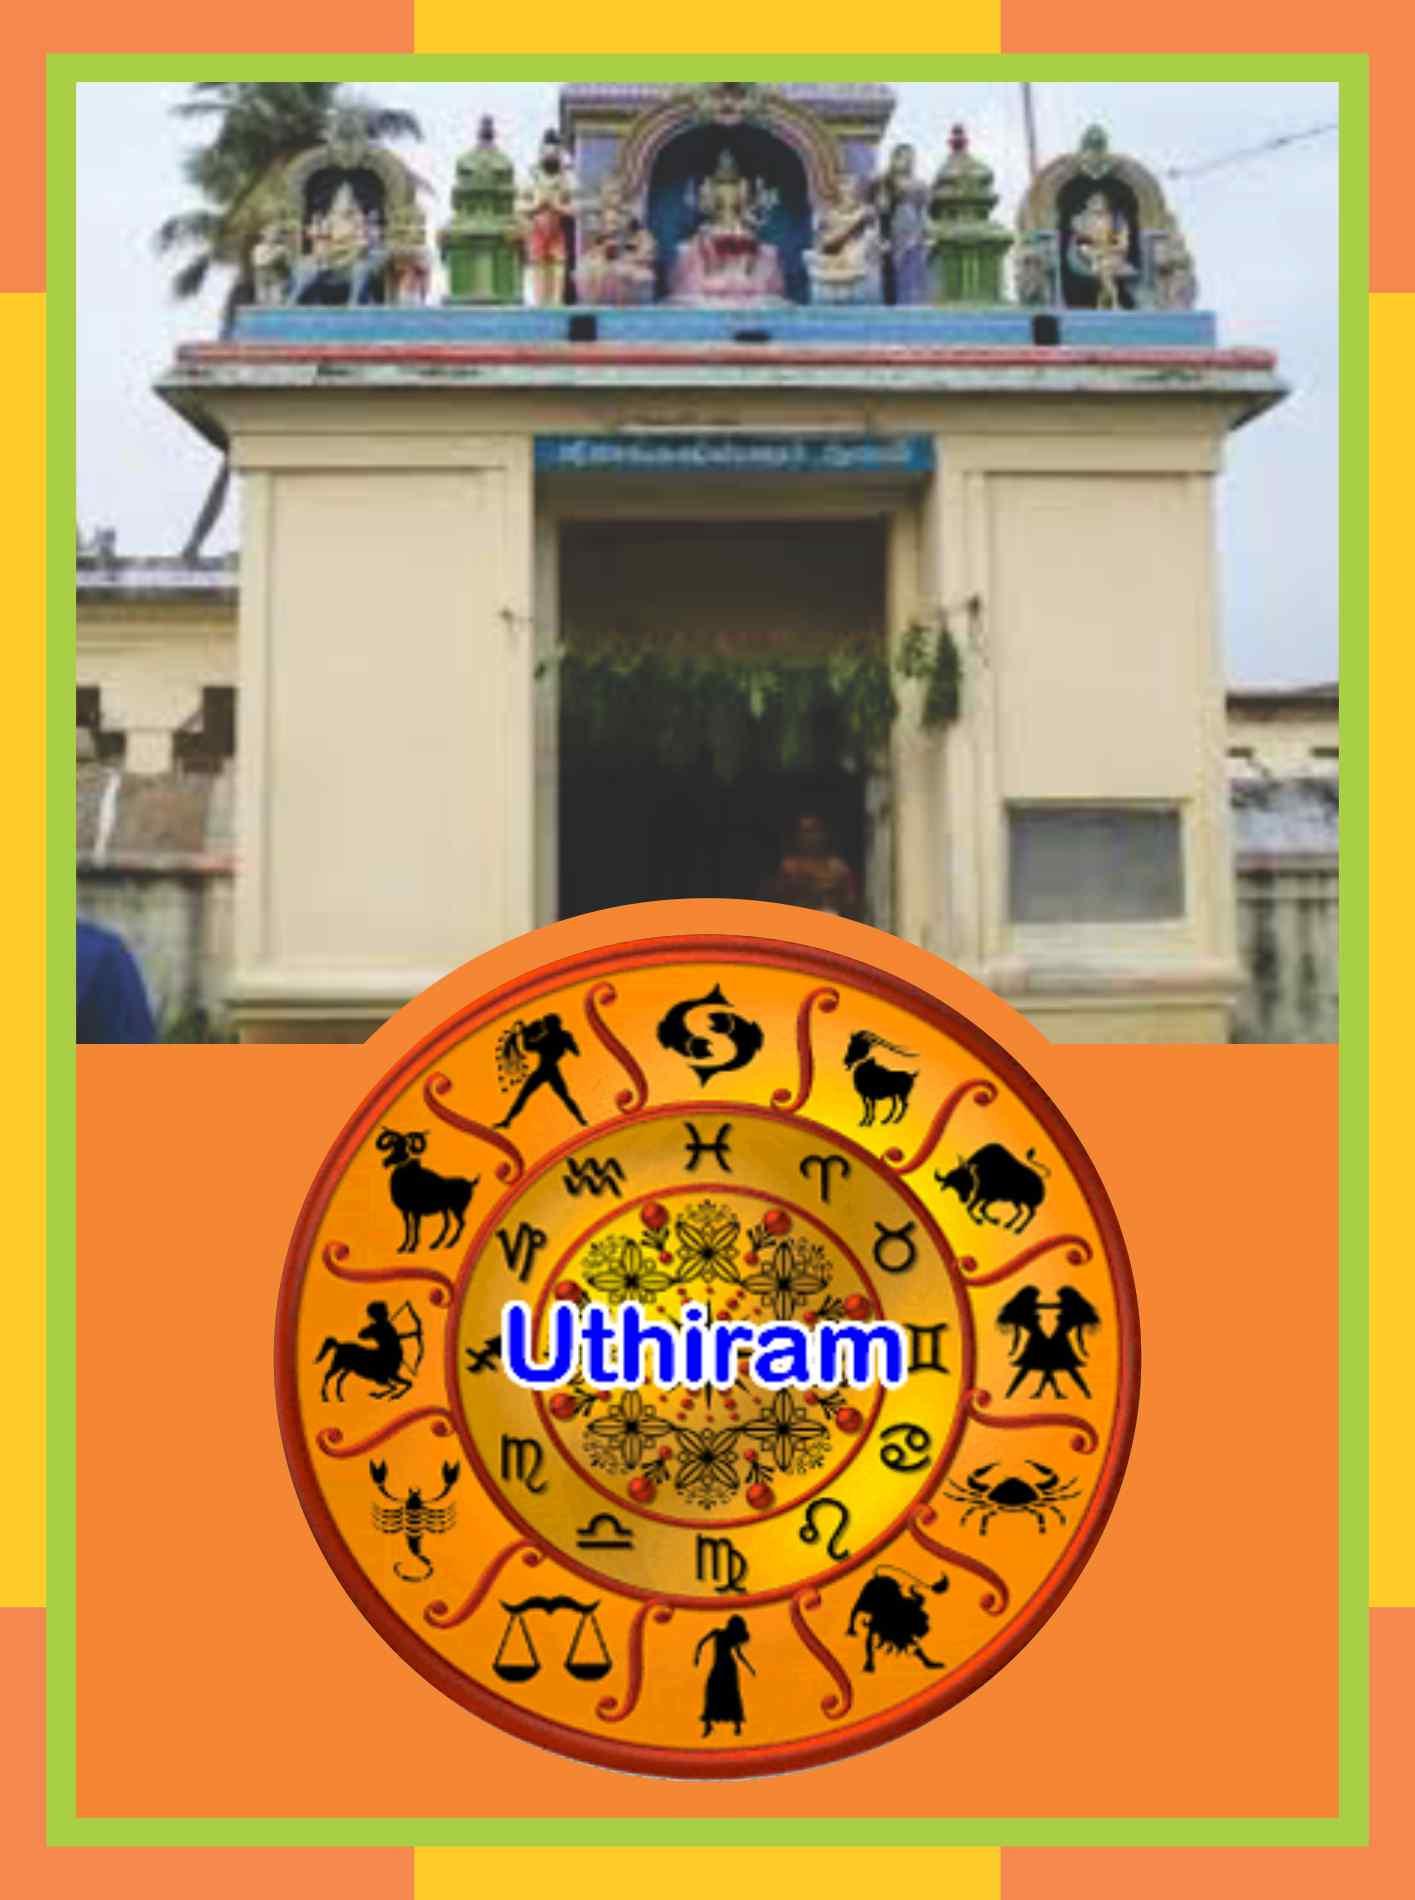 Edayathumangalam - Mangalyeswarar Temple Spl Parihara Puja for Uthiram Star